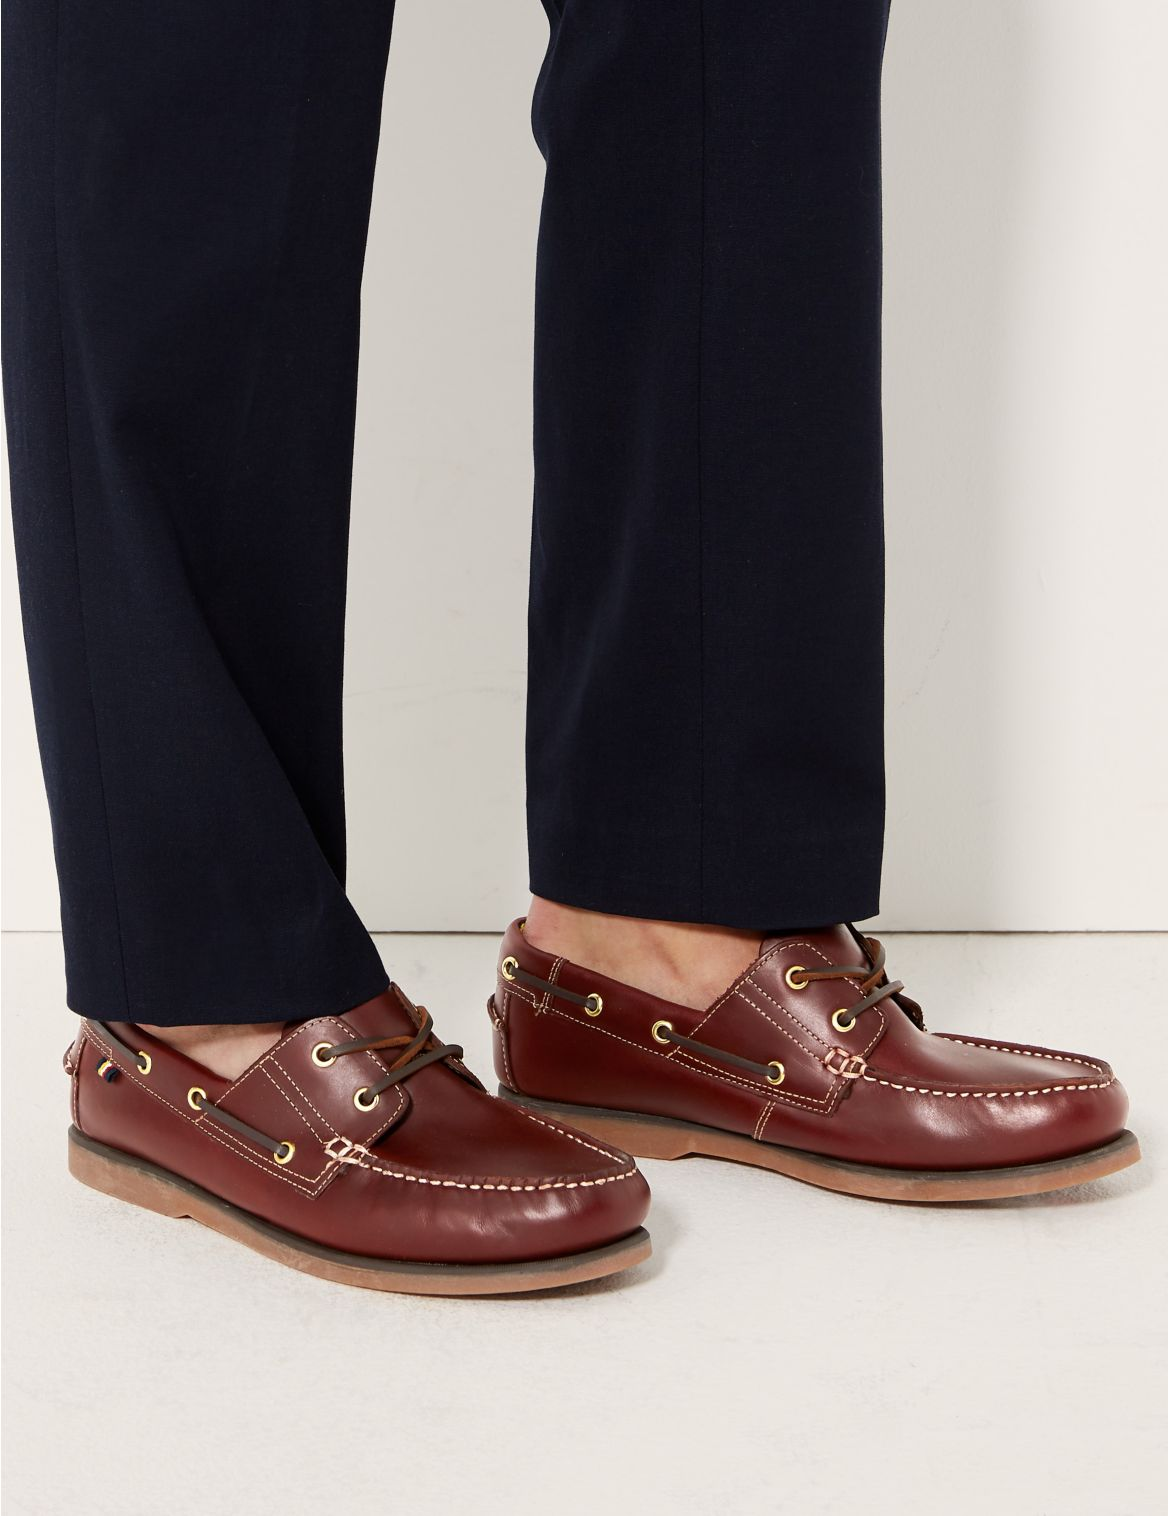 Chaussures bateau extra-larges en cuir. Chaussures bateau extra-larges en cuir